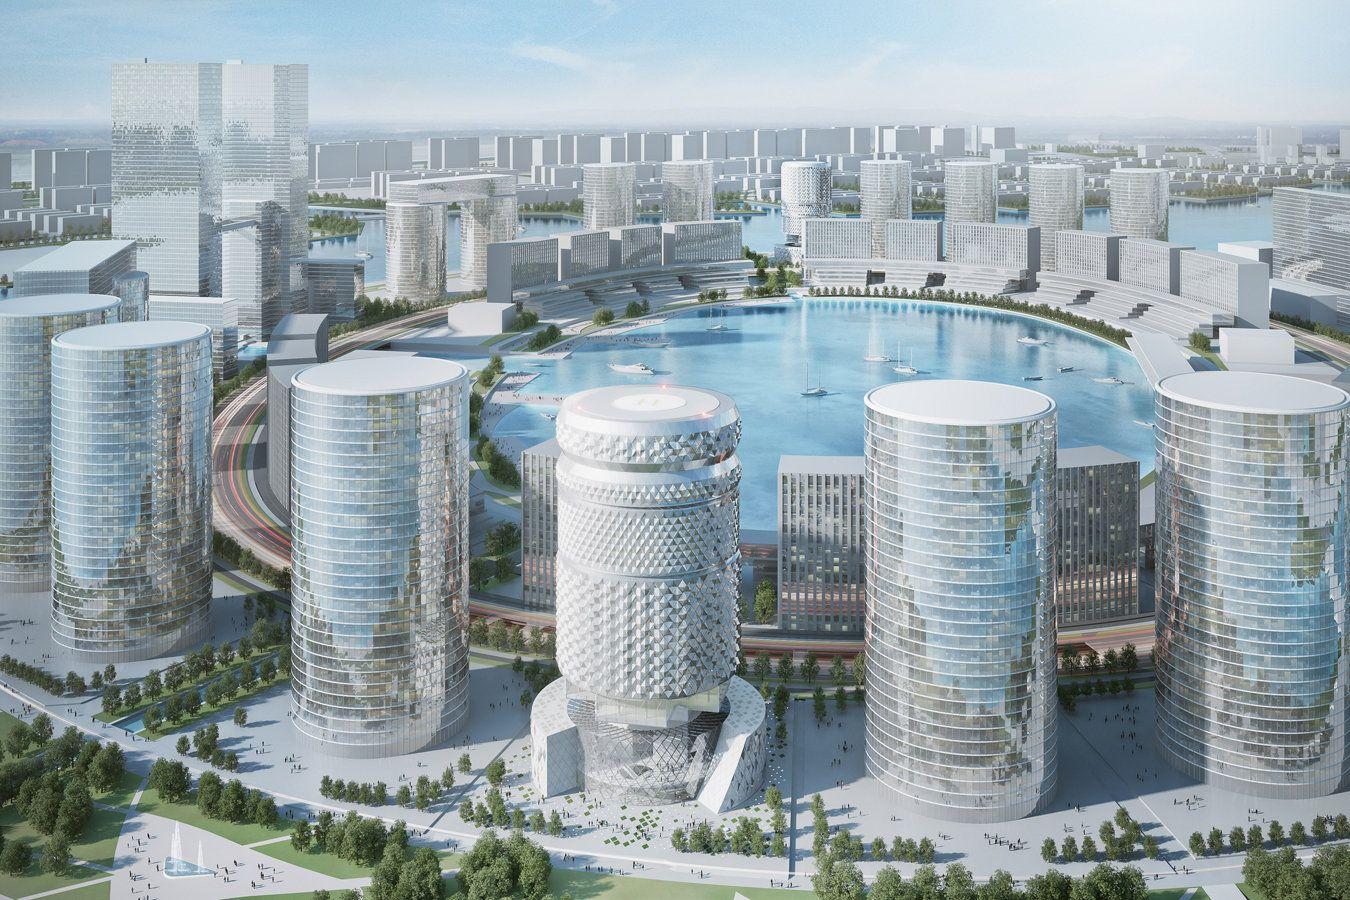 Zhengzhou Commercial Office Towers By Asymptote Architecture Architektura Imperium Wystroj